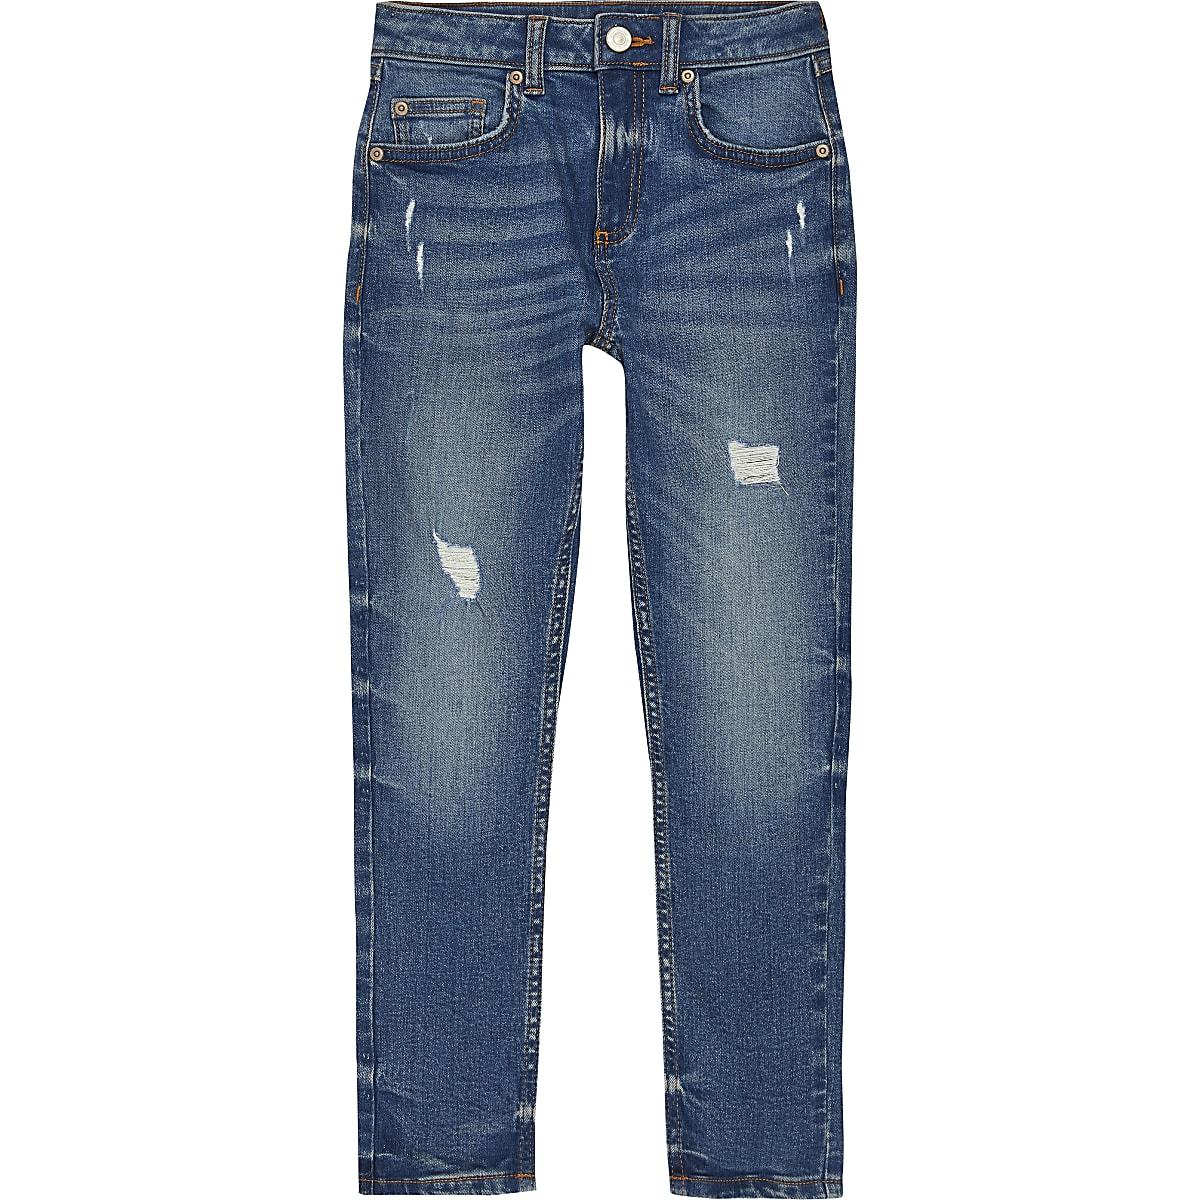 Sid – Dunkelblaue Skinny Jeans im Used-Look